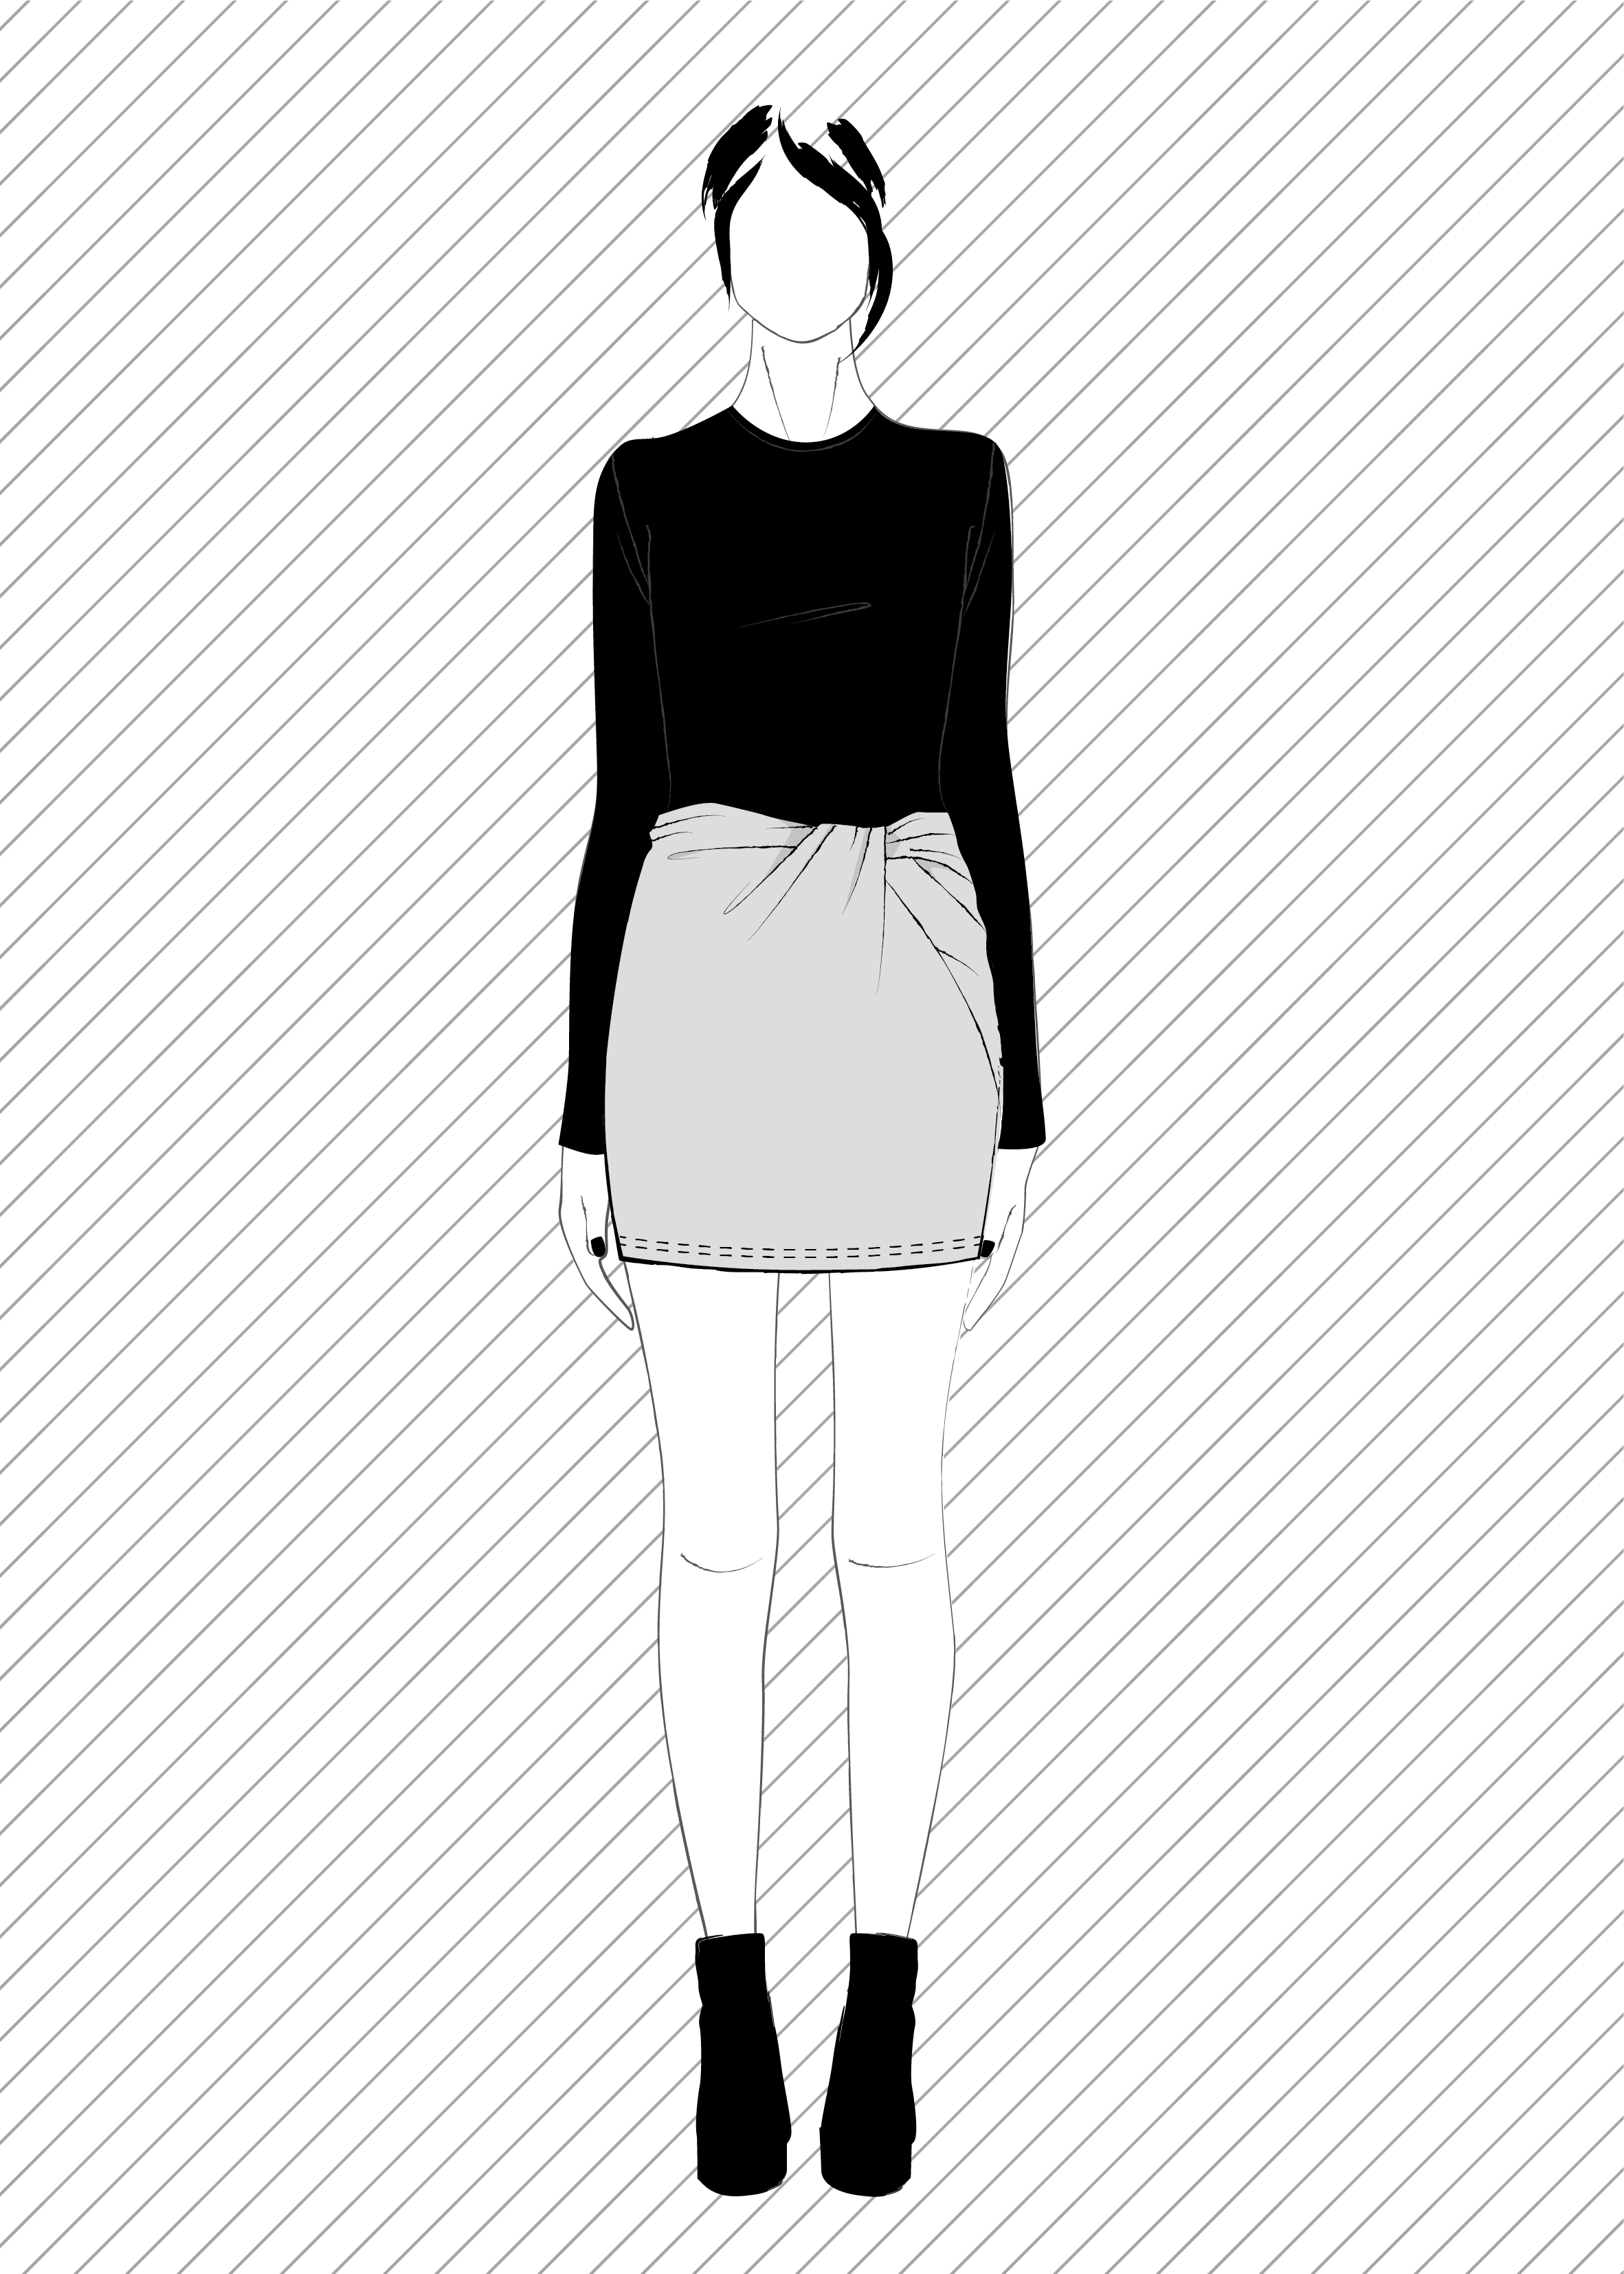 TONARE jupe torsadée - Patron de couture PDF